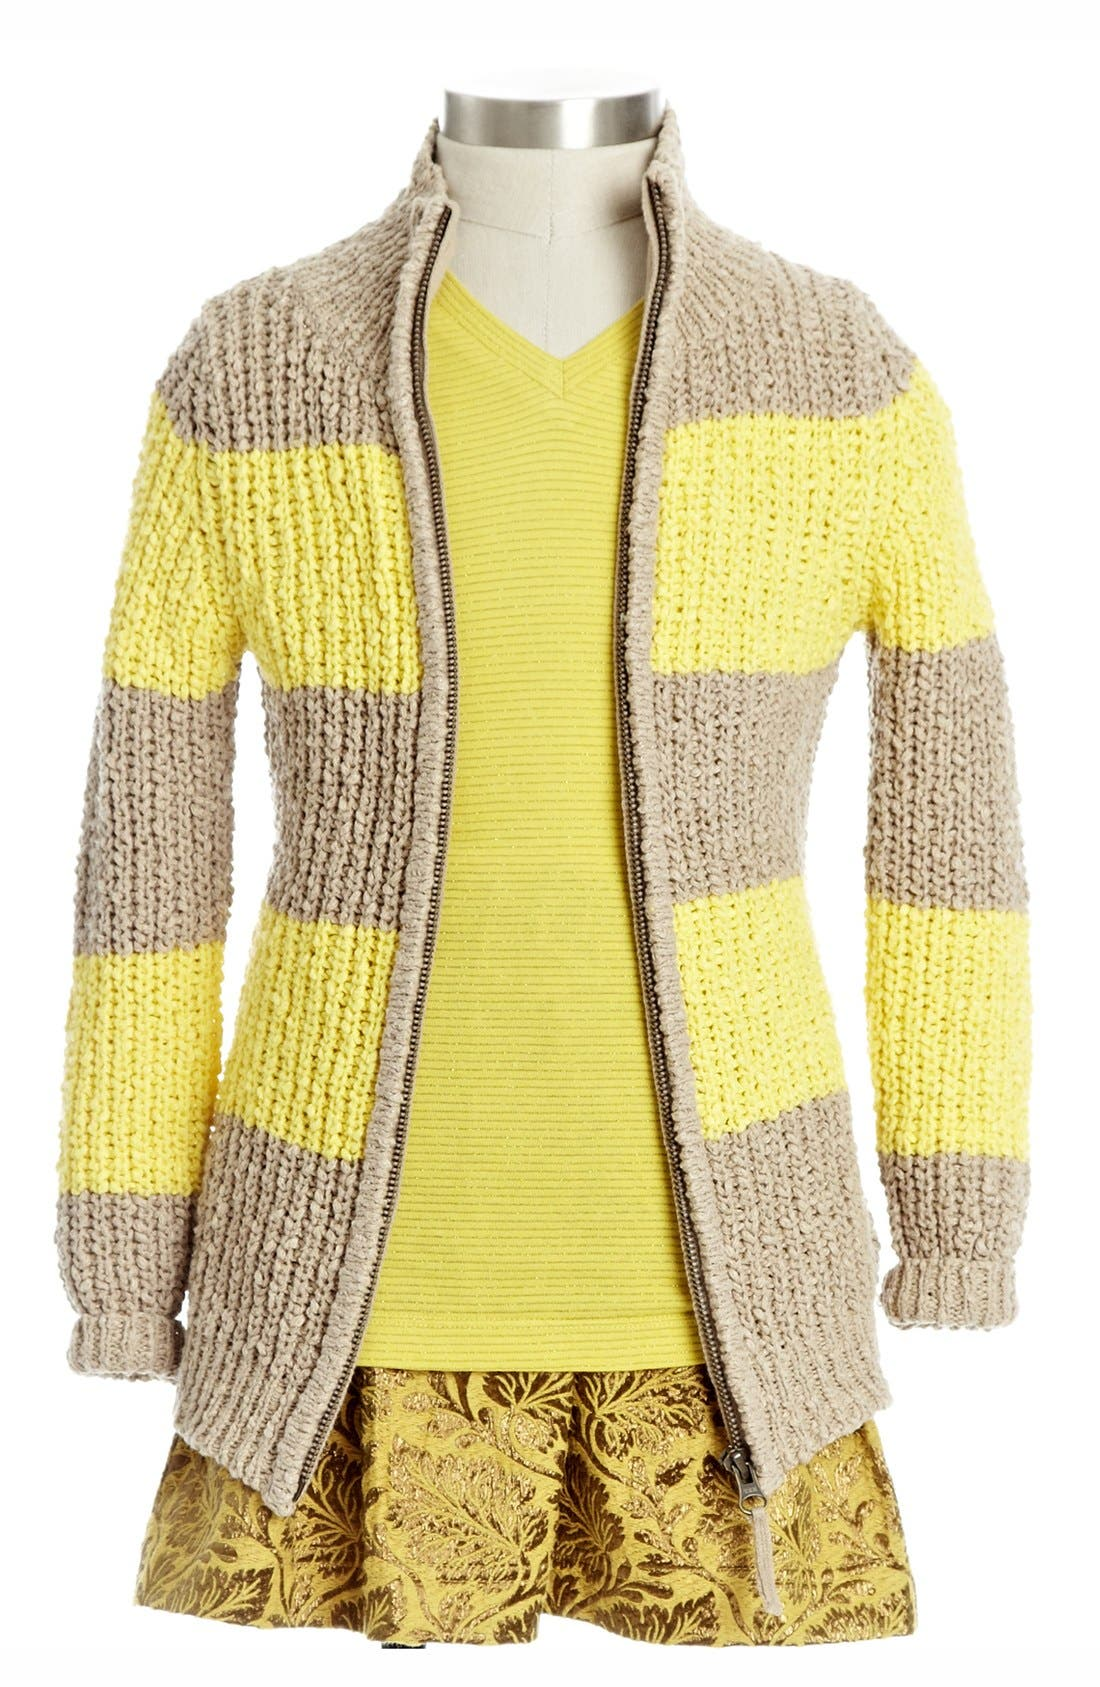 Main Image - Peek 'Vienna' Knit Sweater(Toddler Girls, Little Girls & Big Girls)